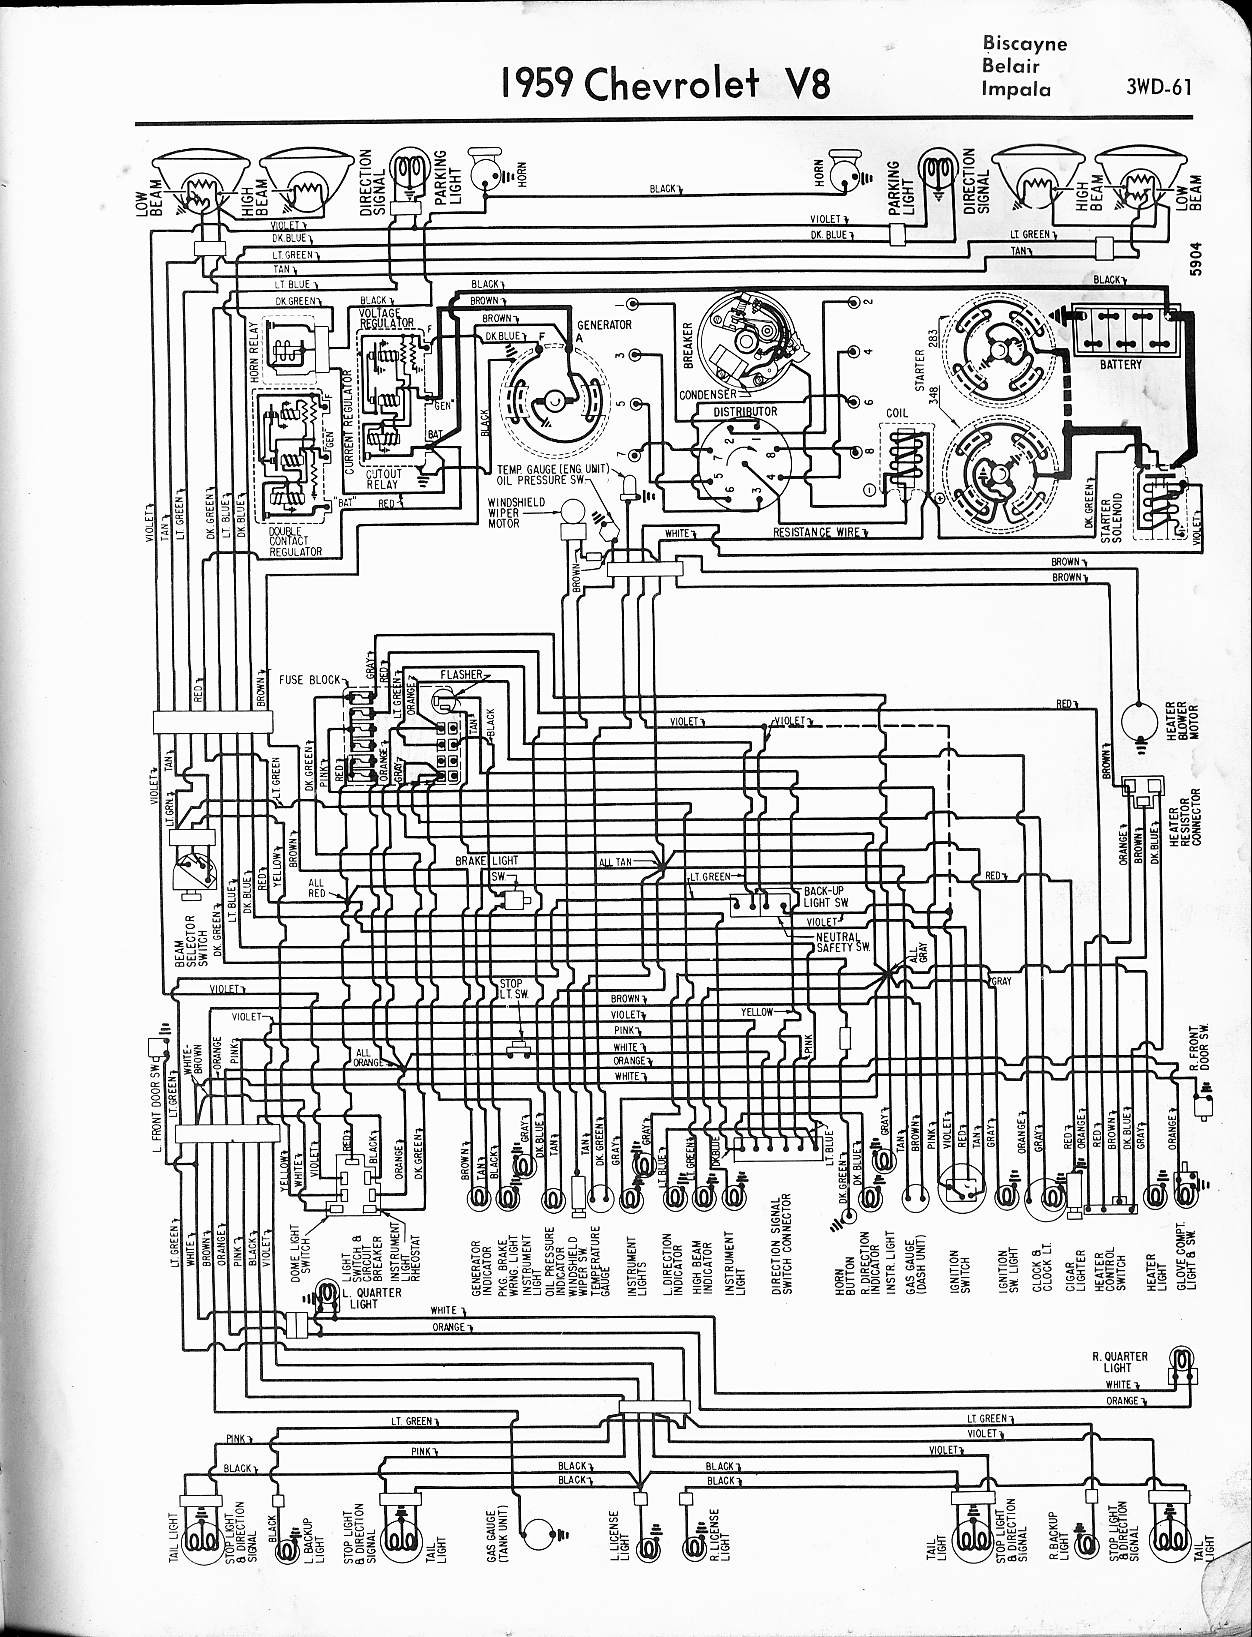 2000 Chevy Impala Engine Diagram Chevy Silverado 1966 Mustang